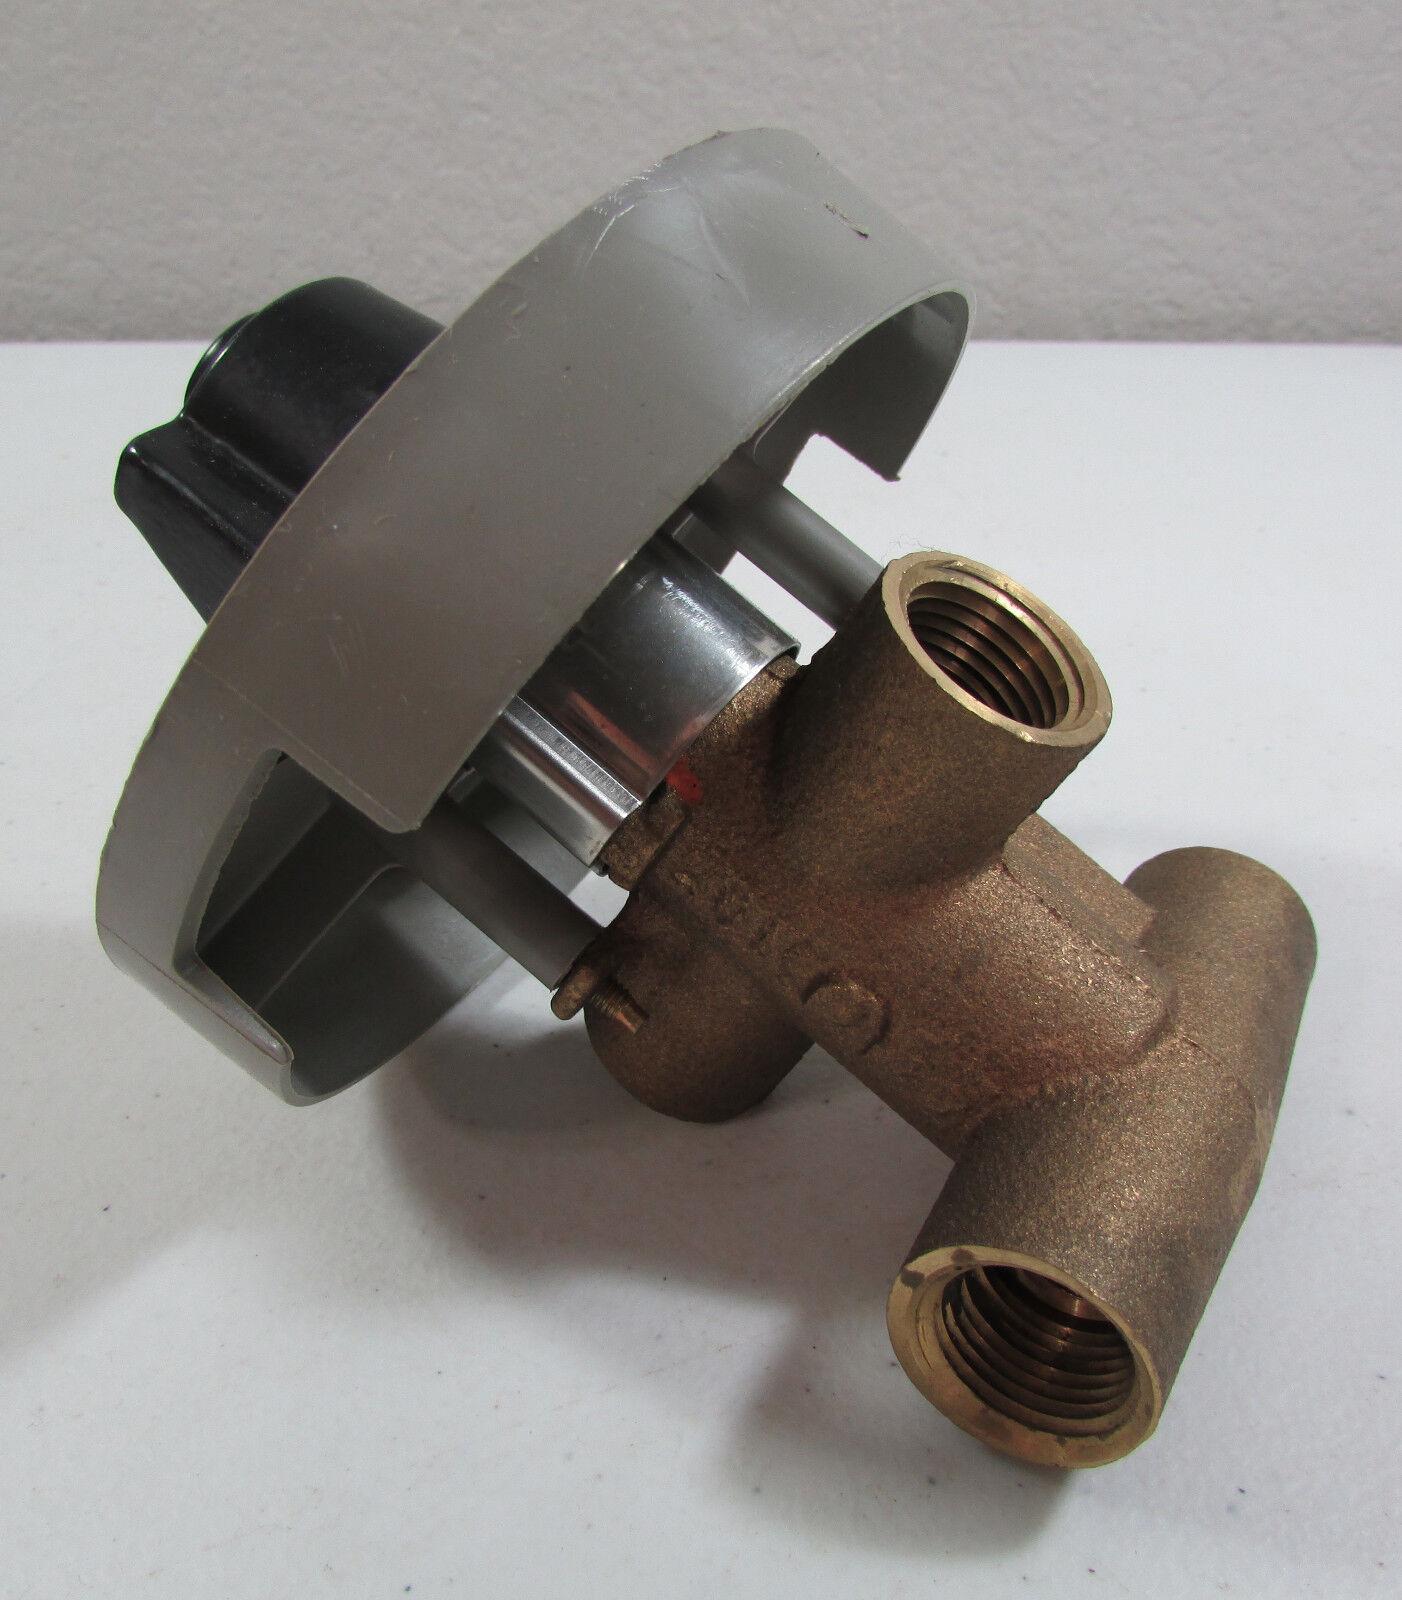 Moen Shower Head 2350 2360 Chrome Plumbing Replacement Repair   eBay